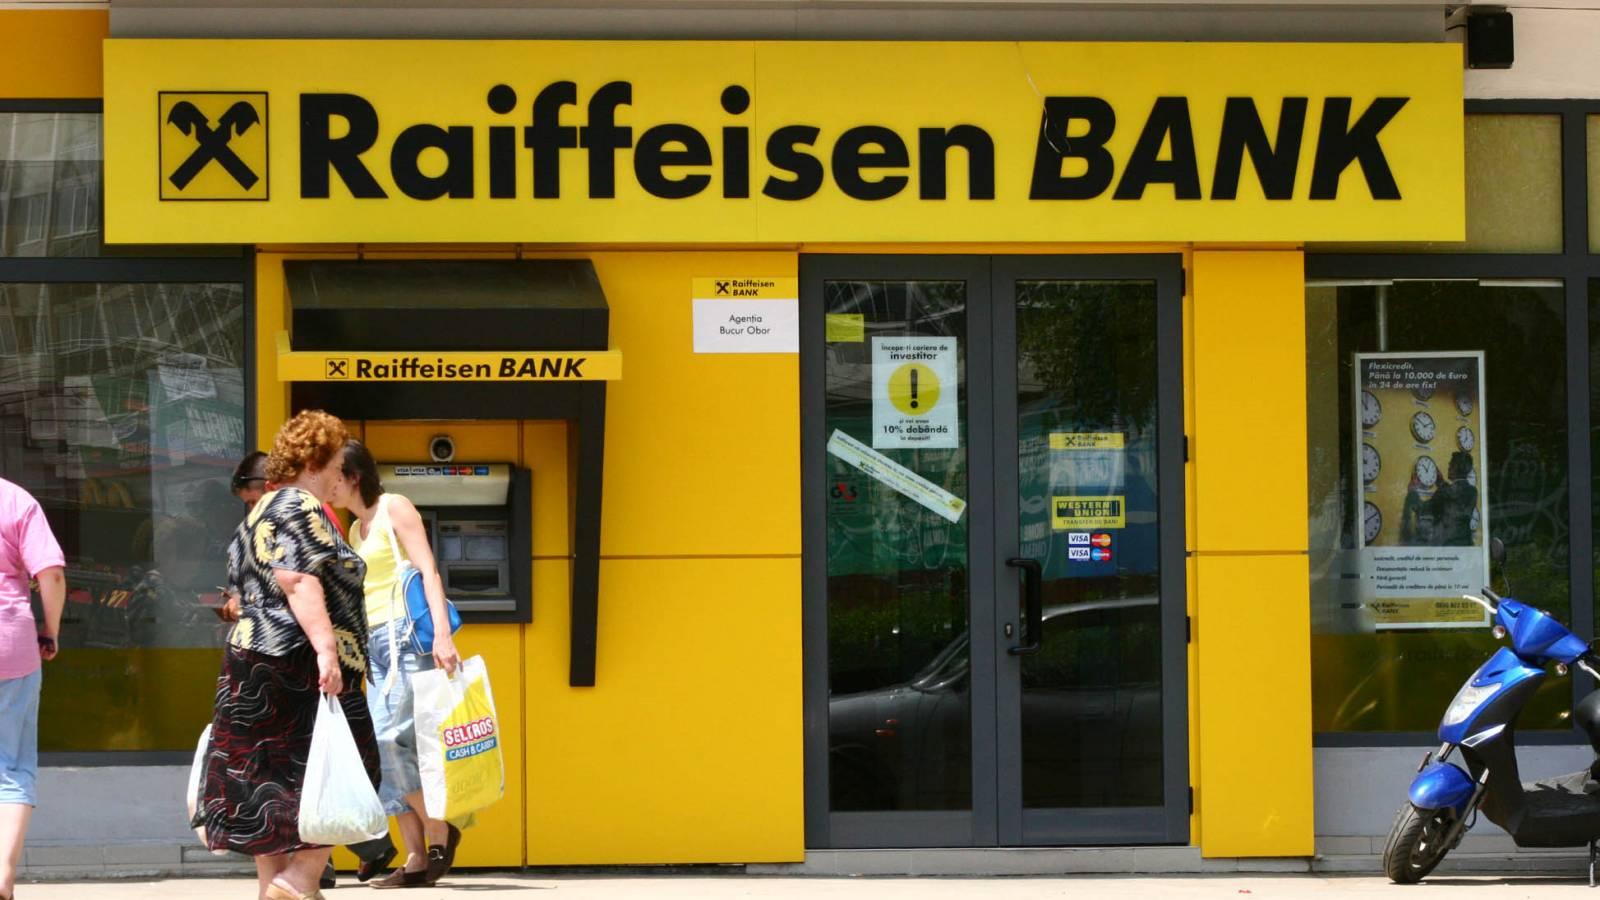 Raiffeisen Bank extindere